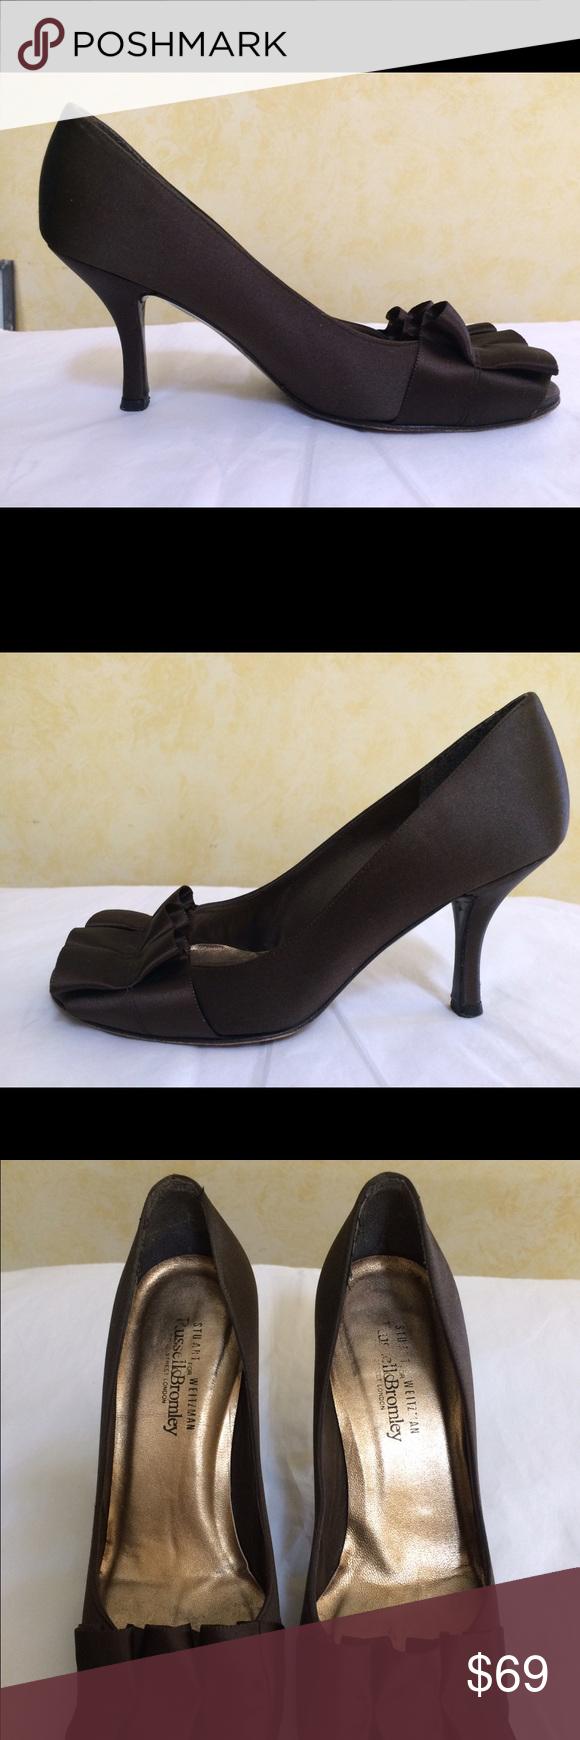 Stuart Weitzman Gigiritz brown satin sz 5.5  $ 350 Stuart Weitzman Gigiritz brown satin sz 5.5 $350 Stuart Weitzman Shoes Heels